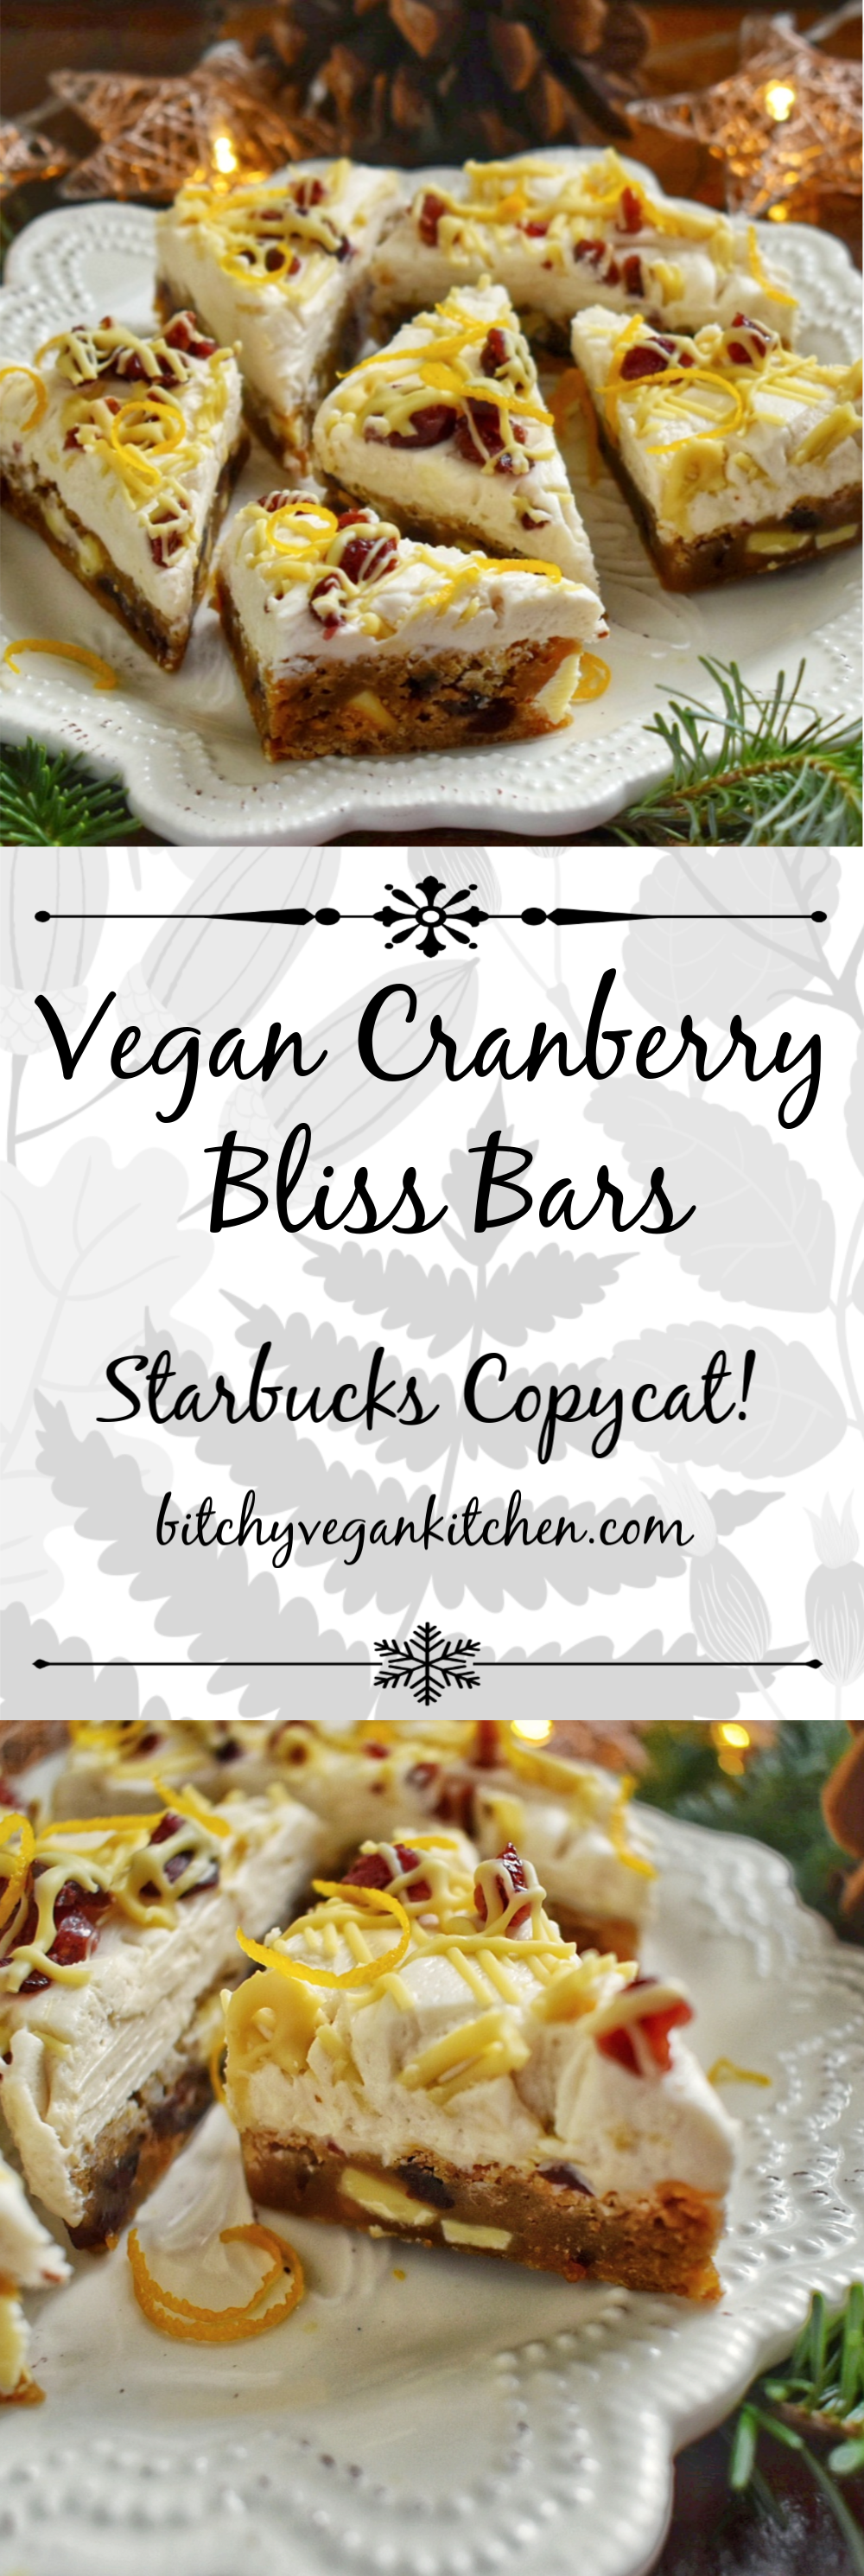 VeganCranberryBlissBarCollage